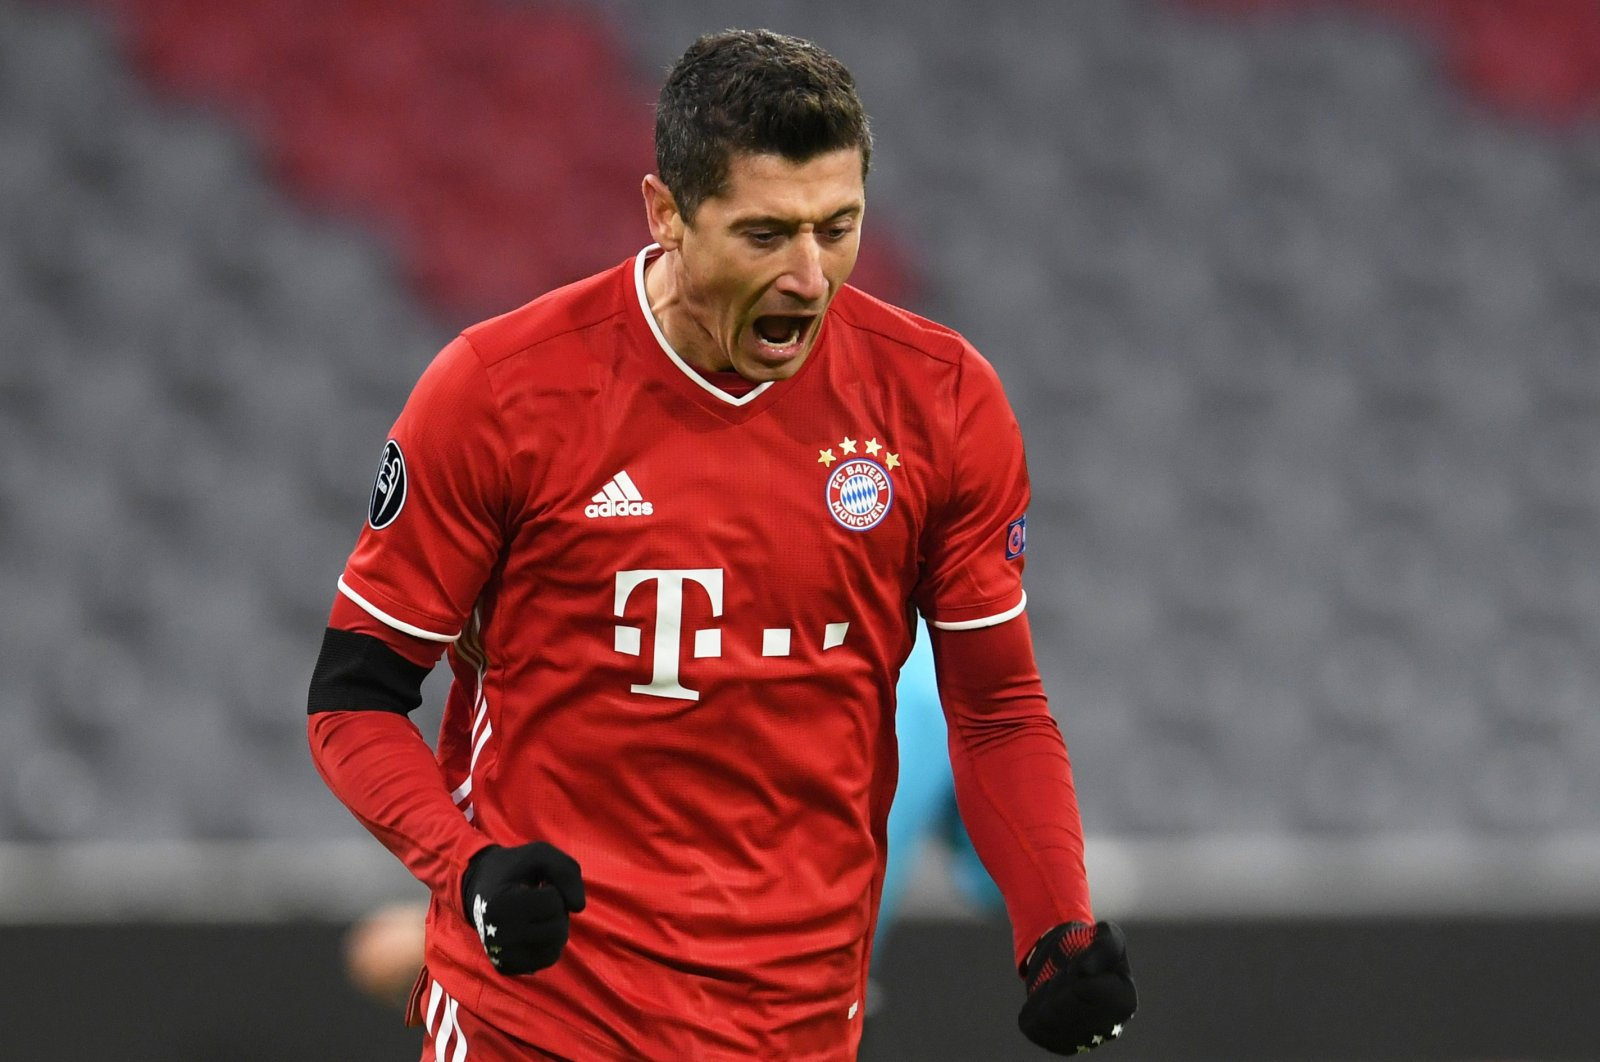 Bayern Munich's Robert Lewandowski celebrates a goal against FC Salzburg during a Champions League match at the Allianz Arena stadium in Munich, Germany, Nov. 25, 2020. (Reuters Photo)